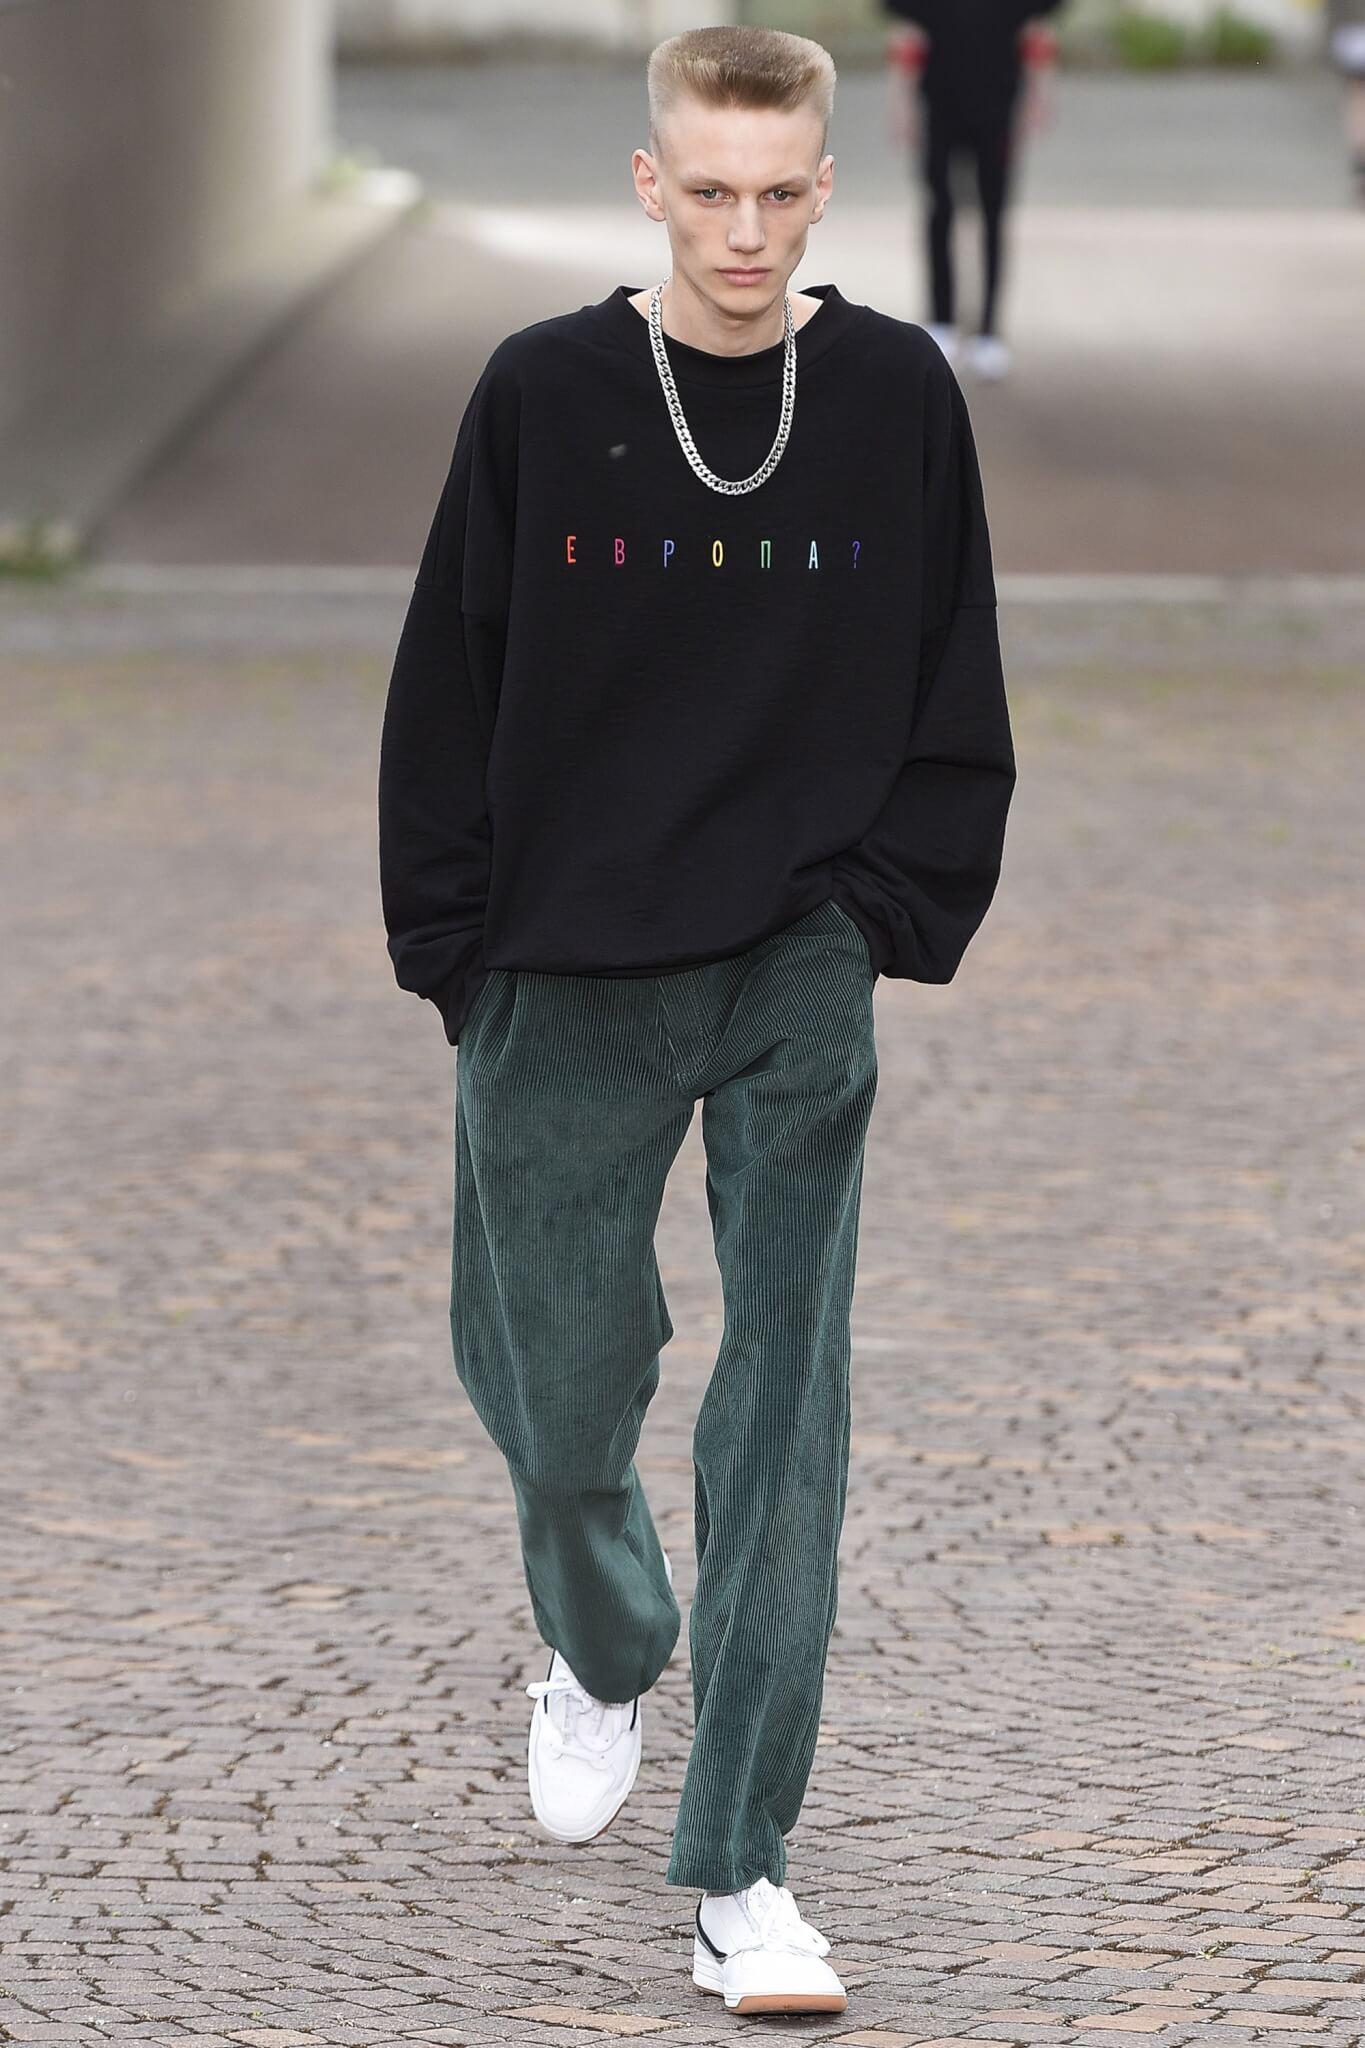 Moda uomo: slogan e statement politici da indossare